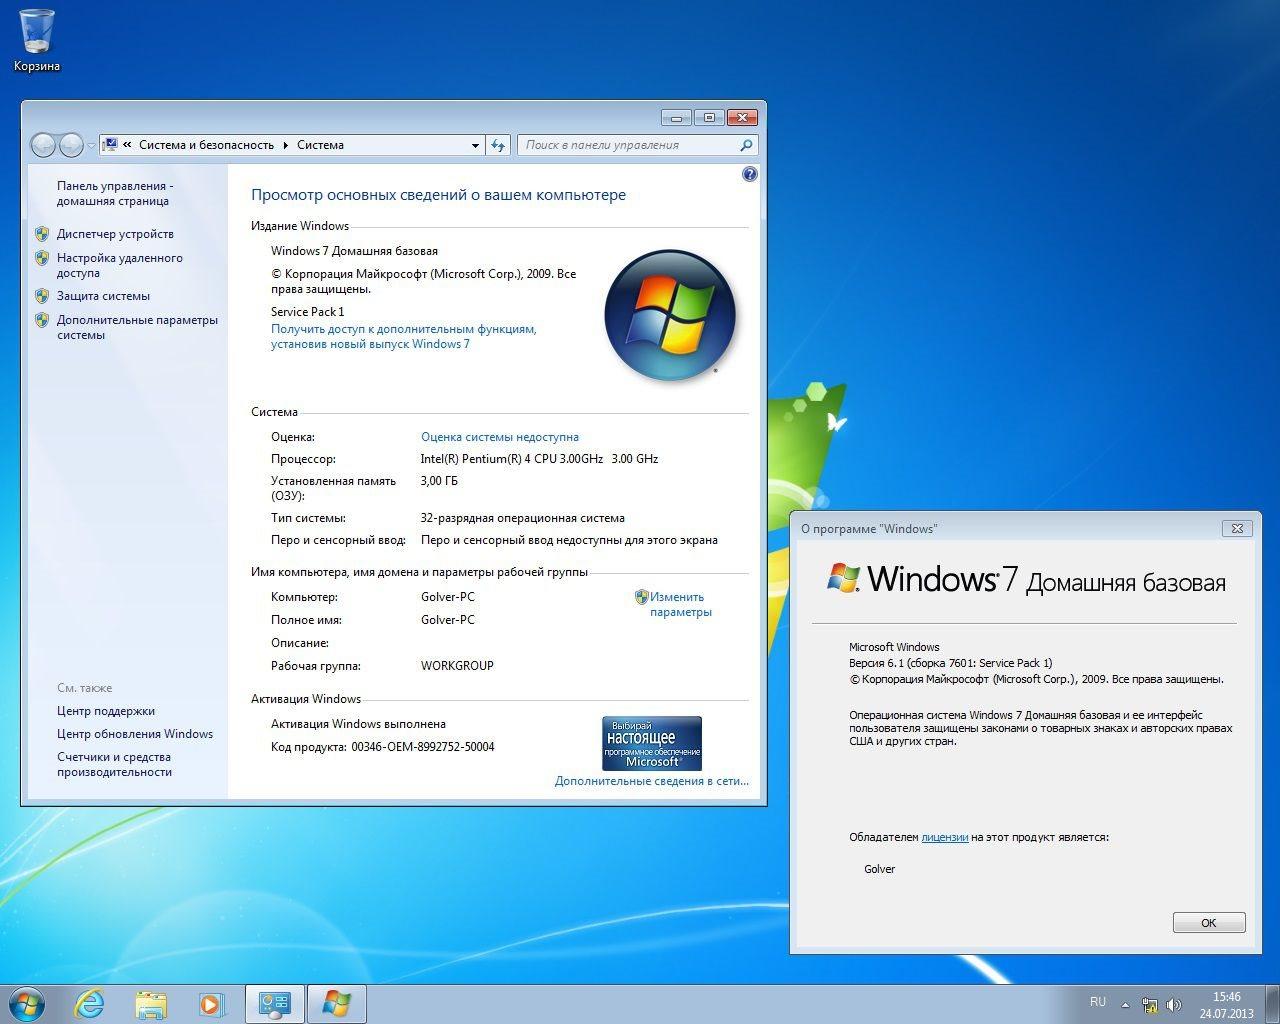 Microsoft Windows 8.1 with Update AIO v1.0 (24in1) - CtrlSoft (x Serial Key